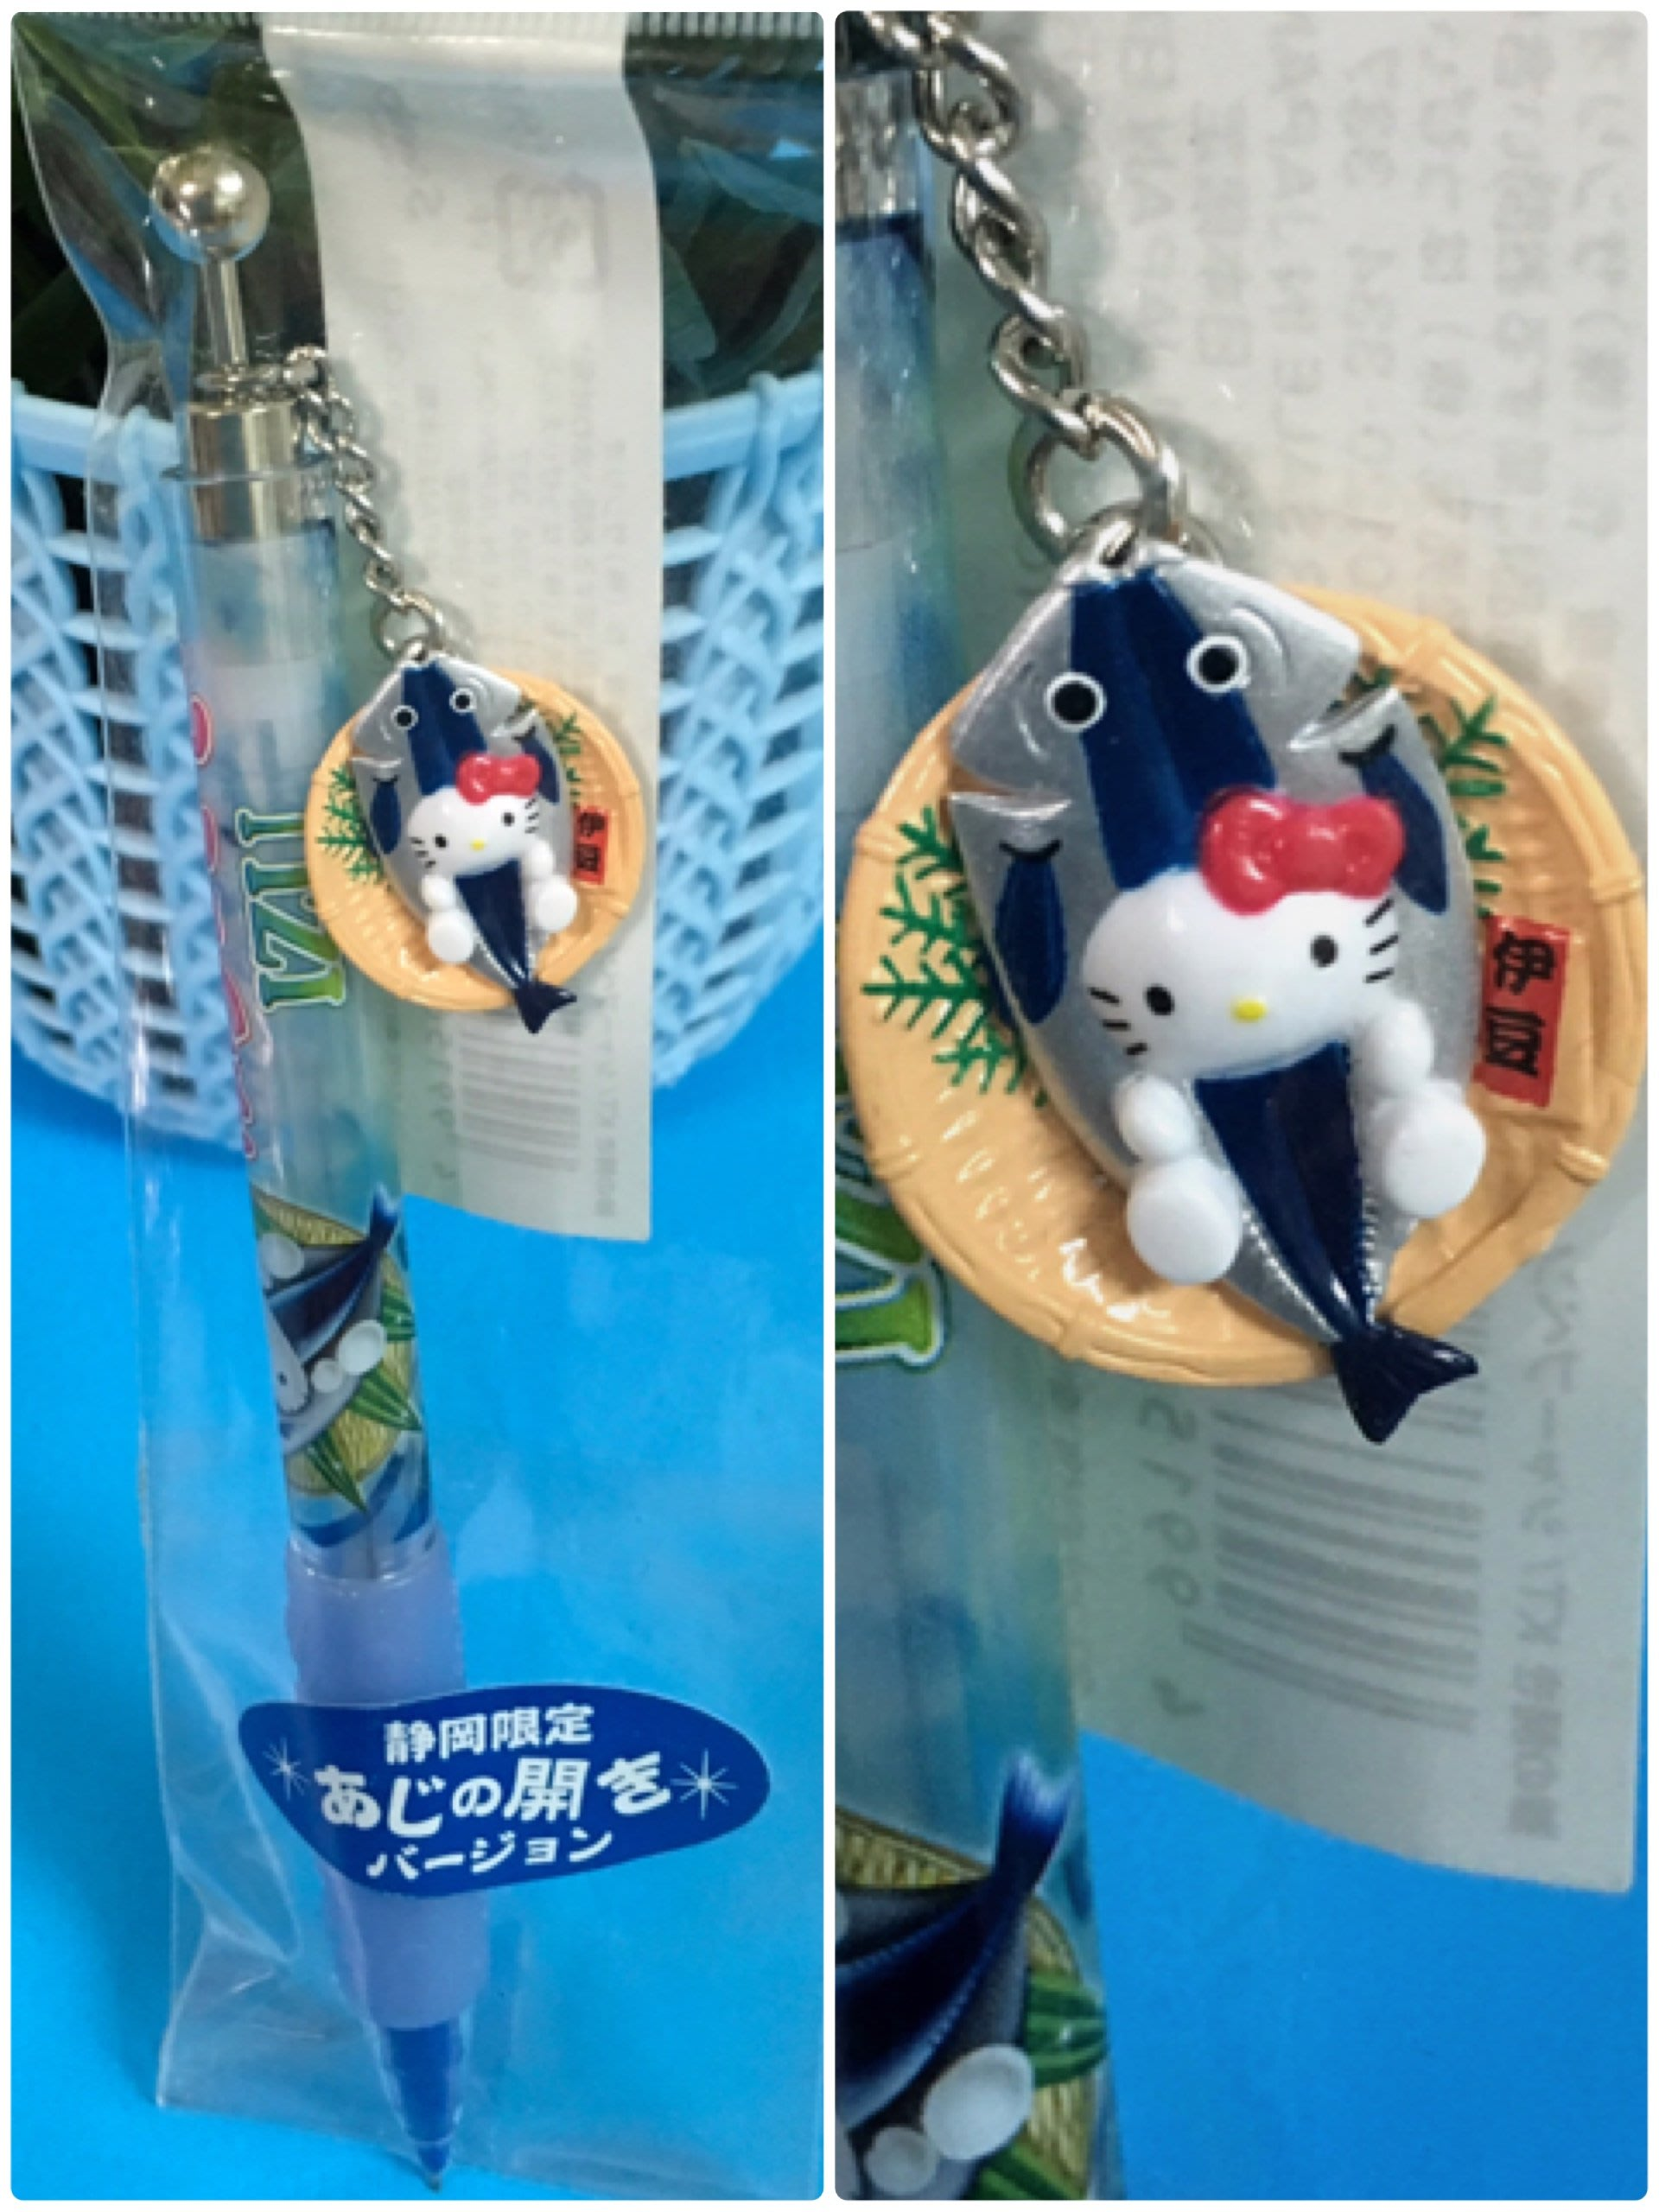 * QP小舖 * 日本靜岡限定《 Hello Kitty 竹莢魚 》0.5mm 自動鉛筆